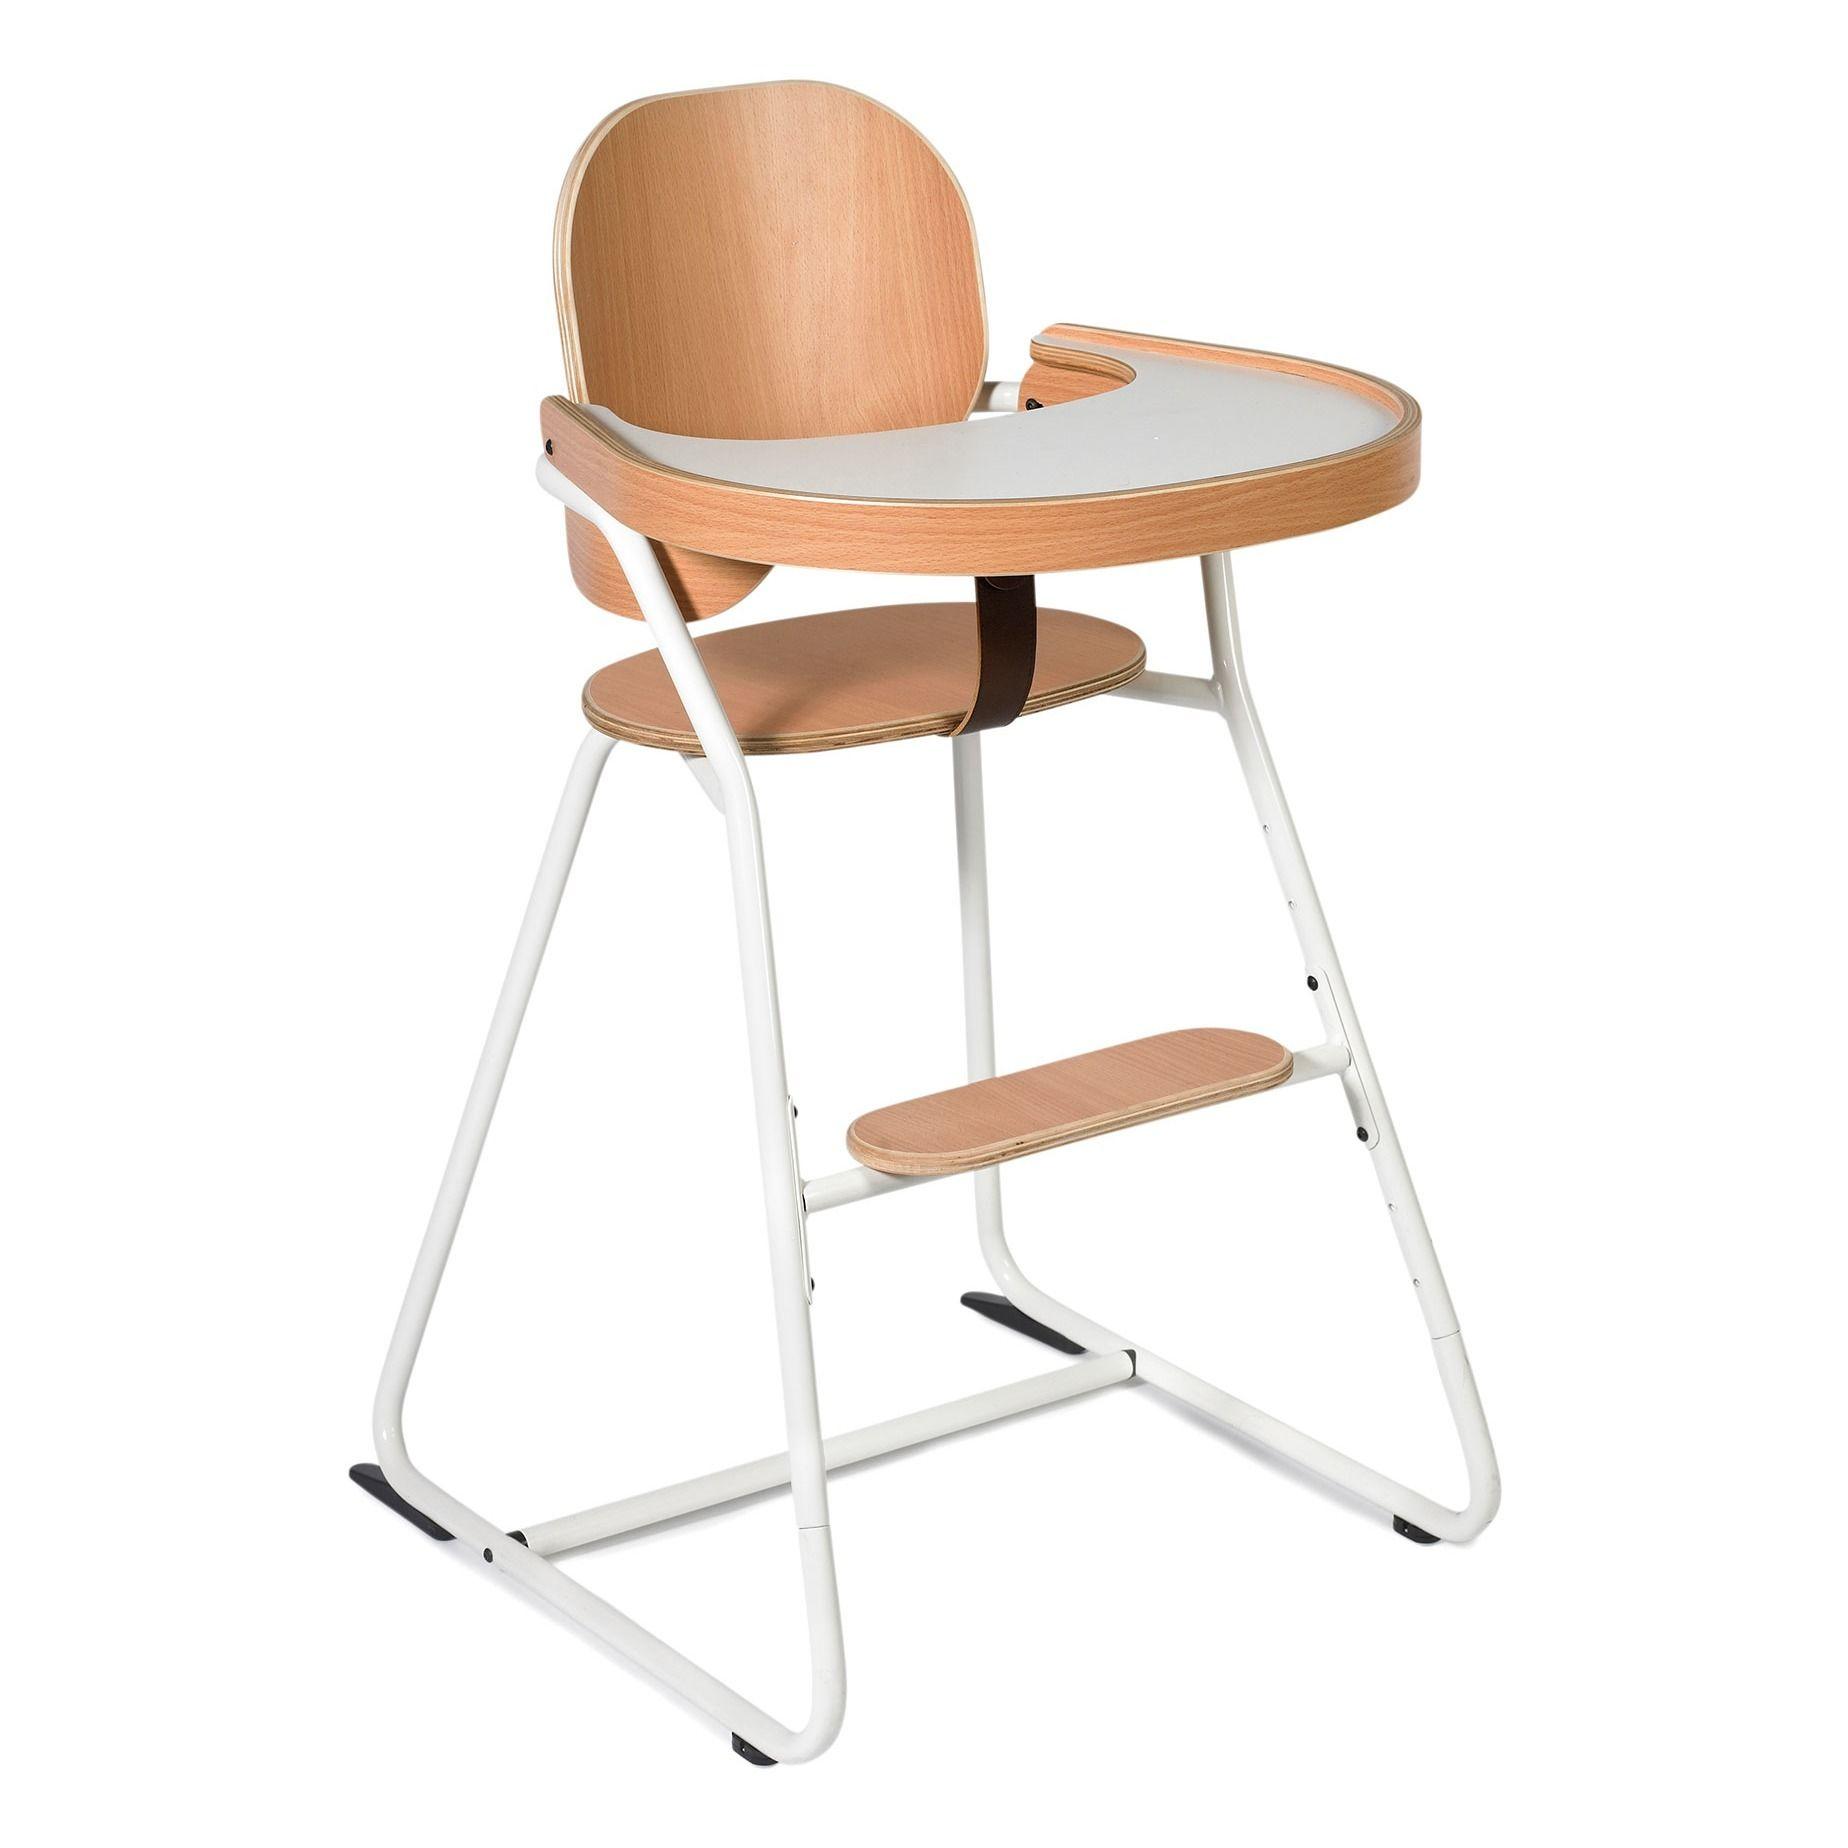 Tibu Adaptive High Chair Table Top Leather Crotch Strap By Charlie Crane High Chair Metal Frame Chair Tibu